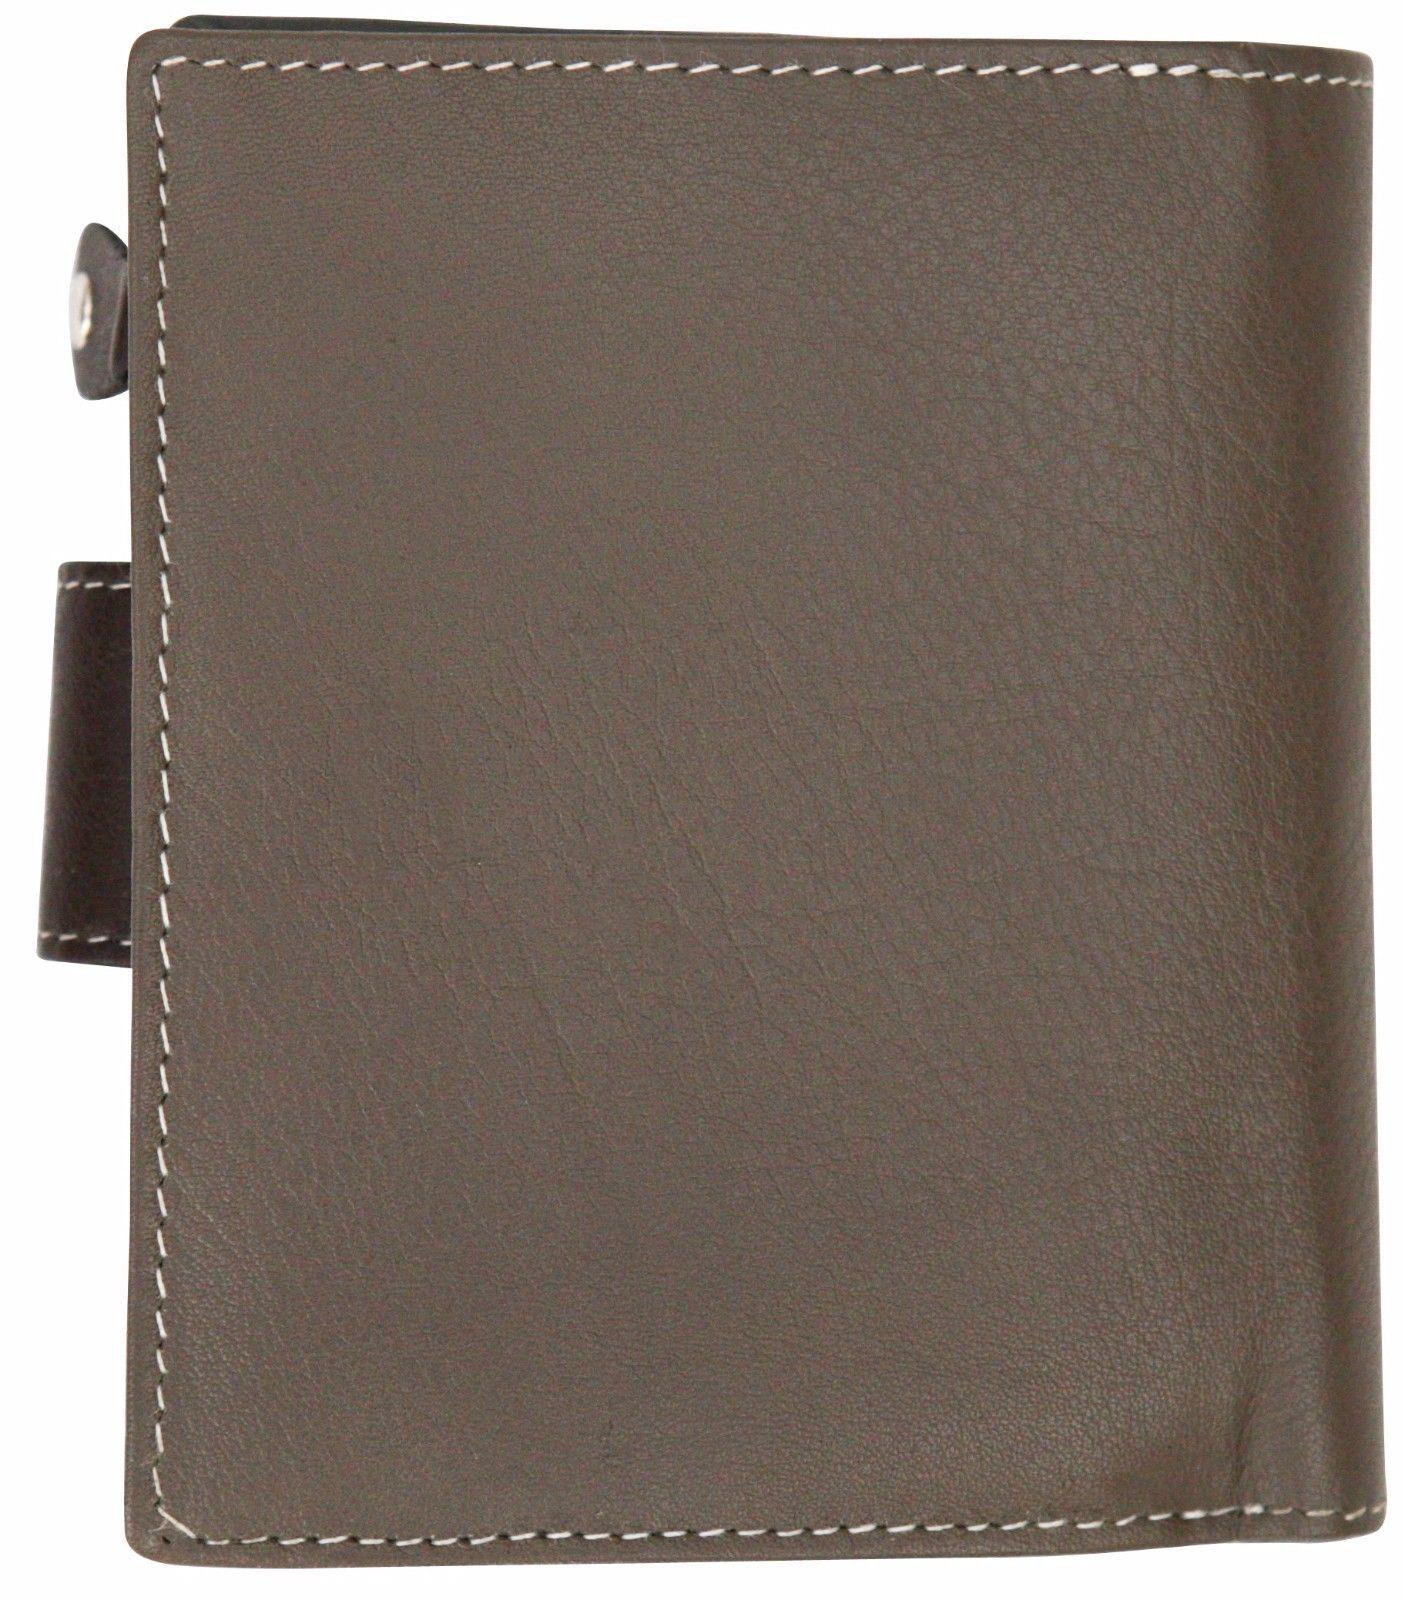 Felda-RFID-onorevoli-MEDAGLIA-amp-Card-Purse-Wallet-Genuine-Leather-Multi-SOFT-BOX-REGALO miniatura 56